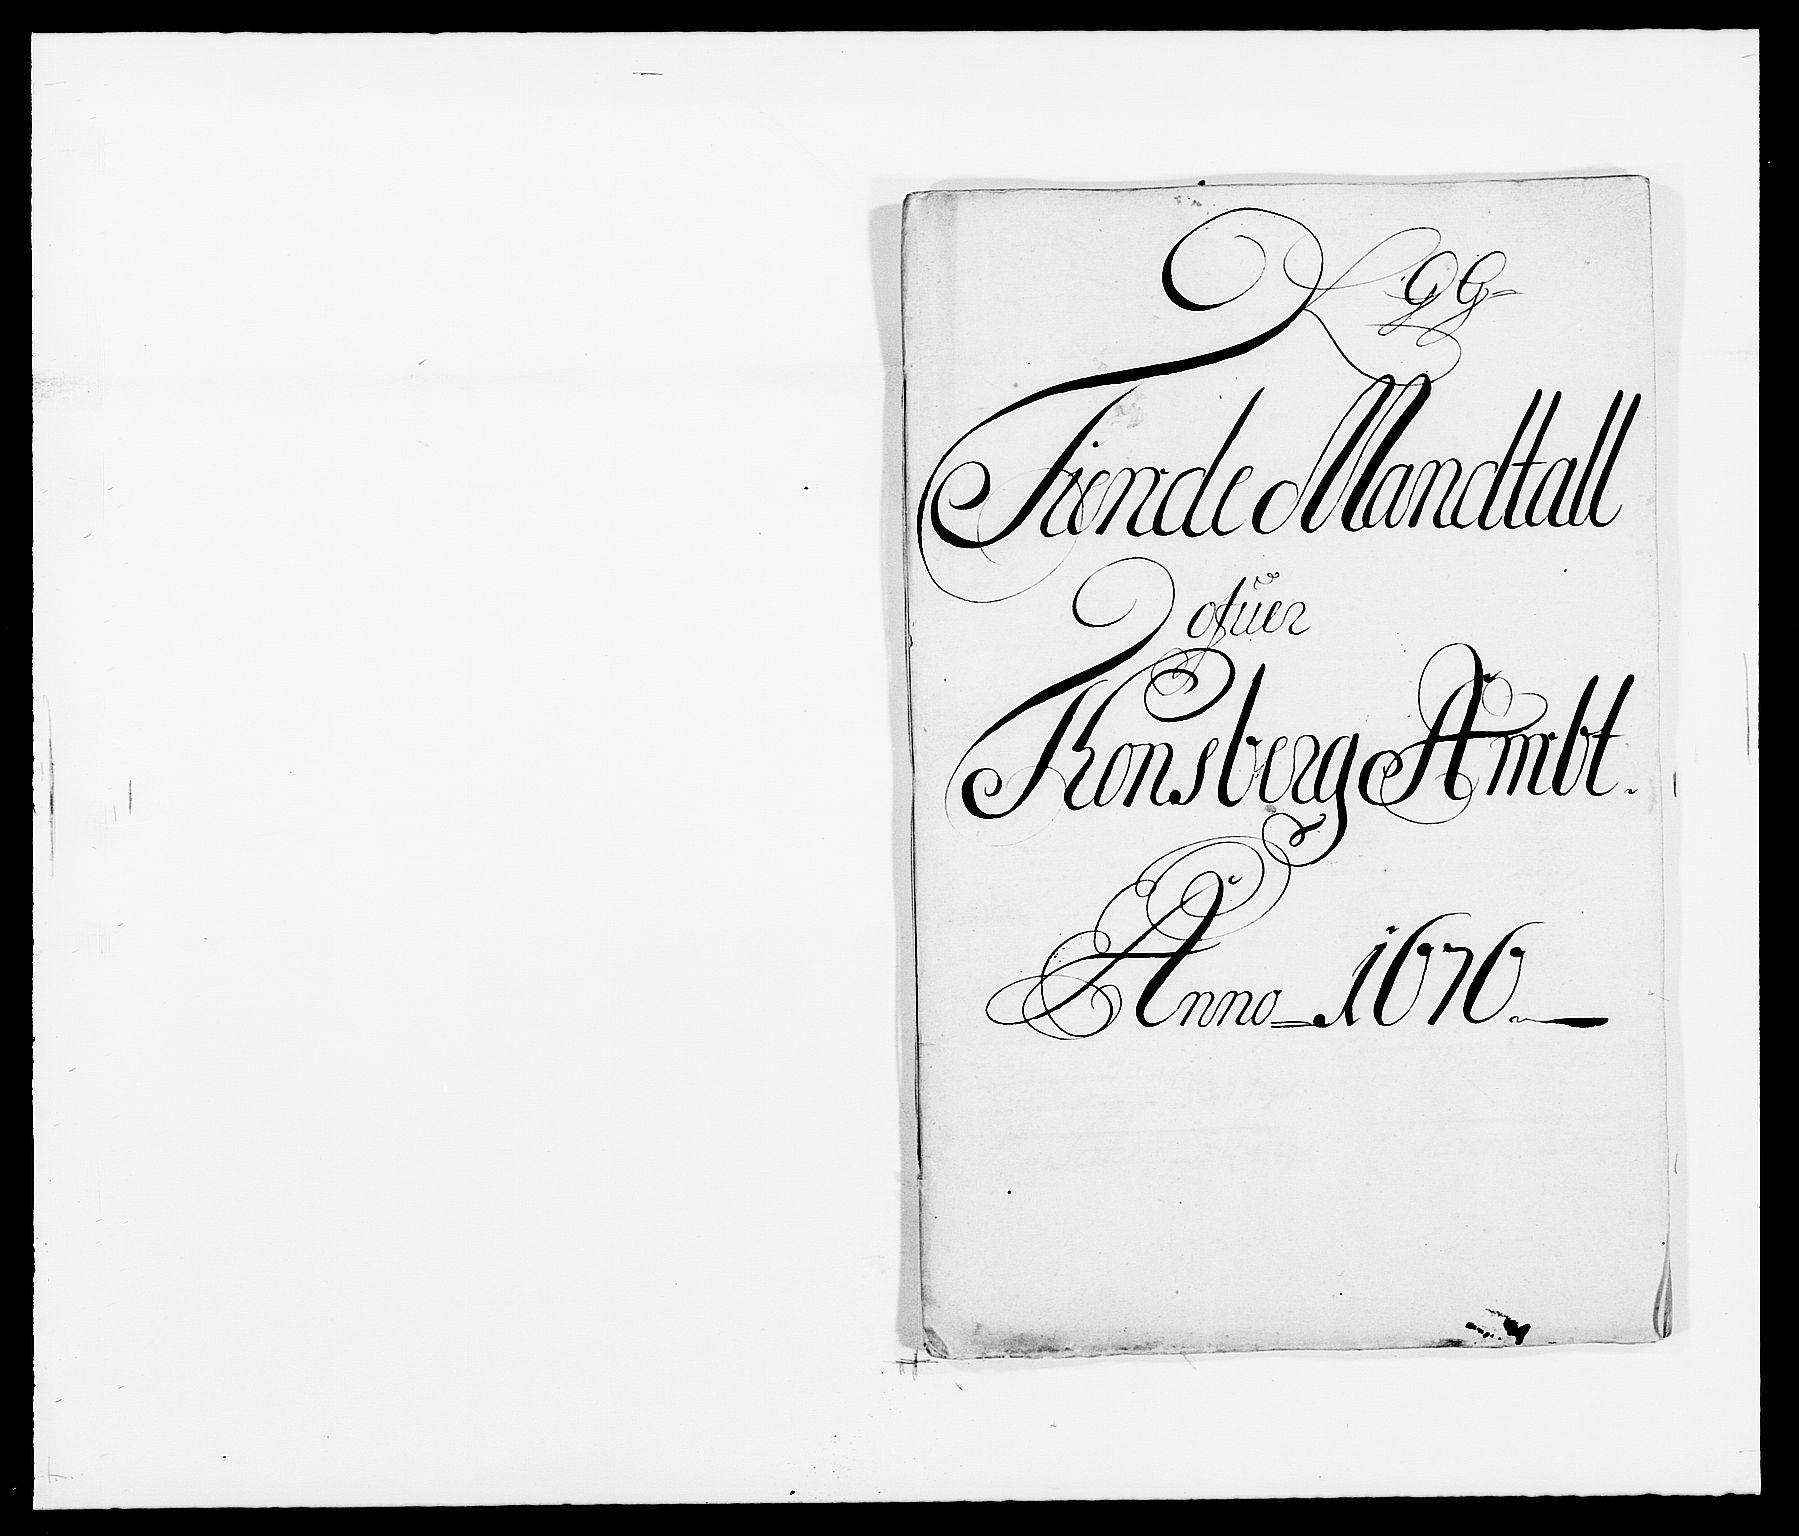 RA, Rentekammeret inntil 1814, Reviderte regnskaper, Fogderegnskap, R32/L1845: Fogderegnskap Jarlsberg grevskap, 1676-1678, s. 159